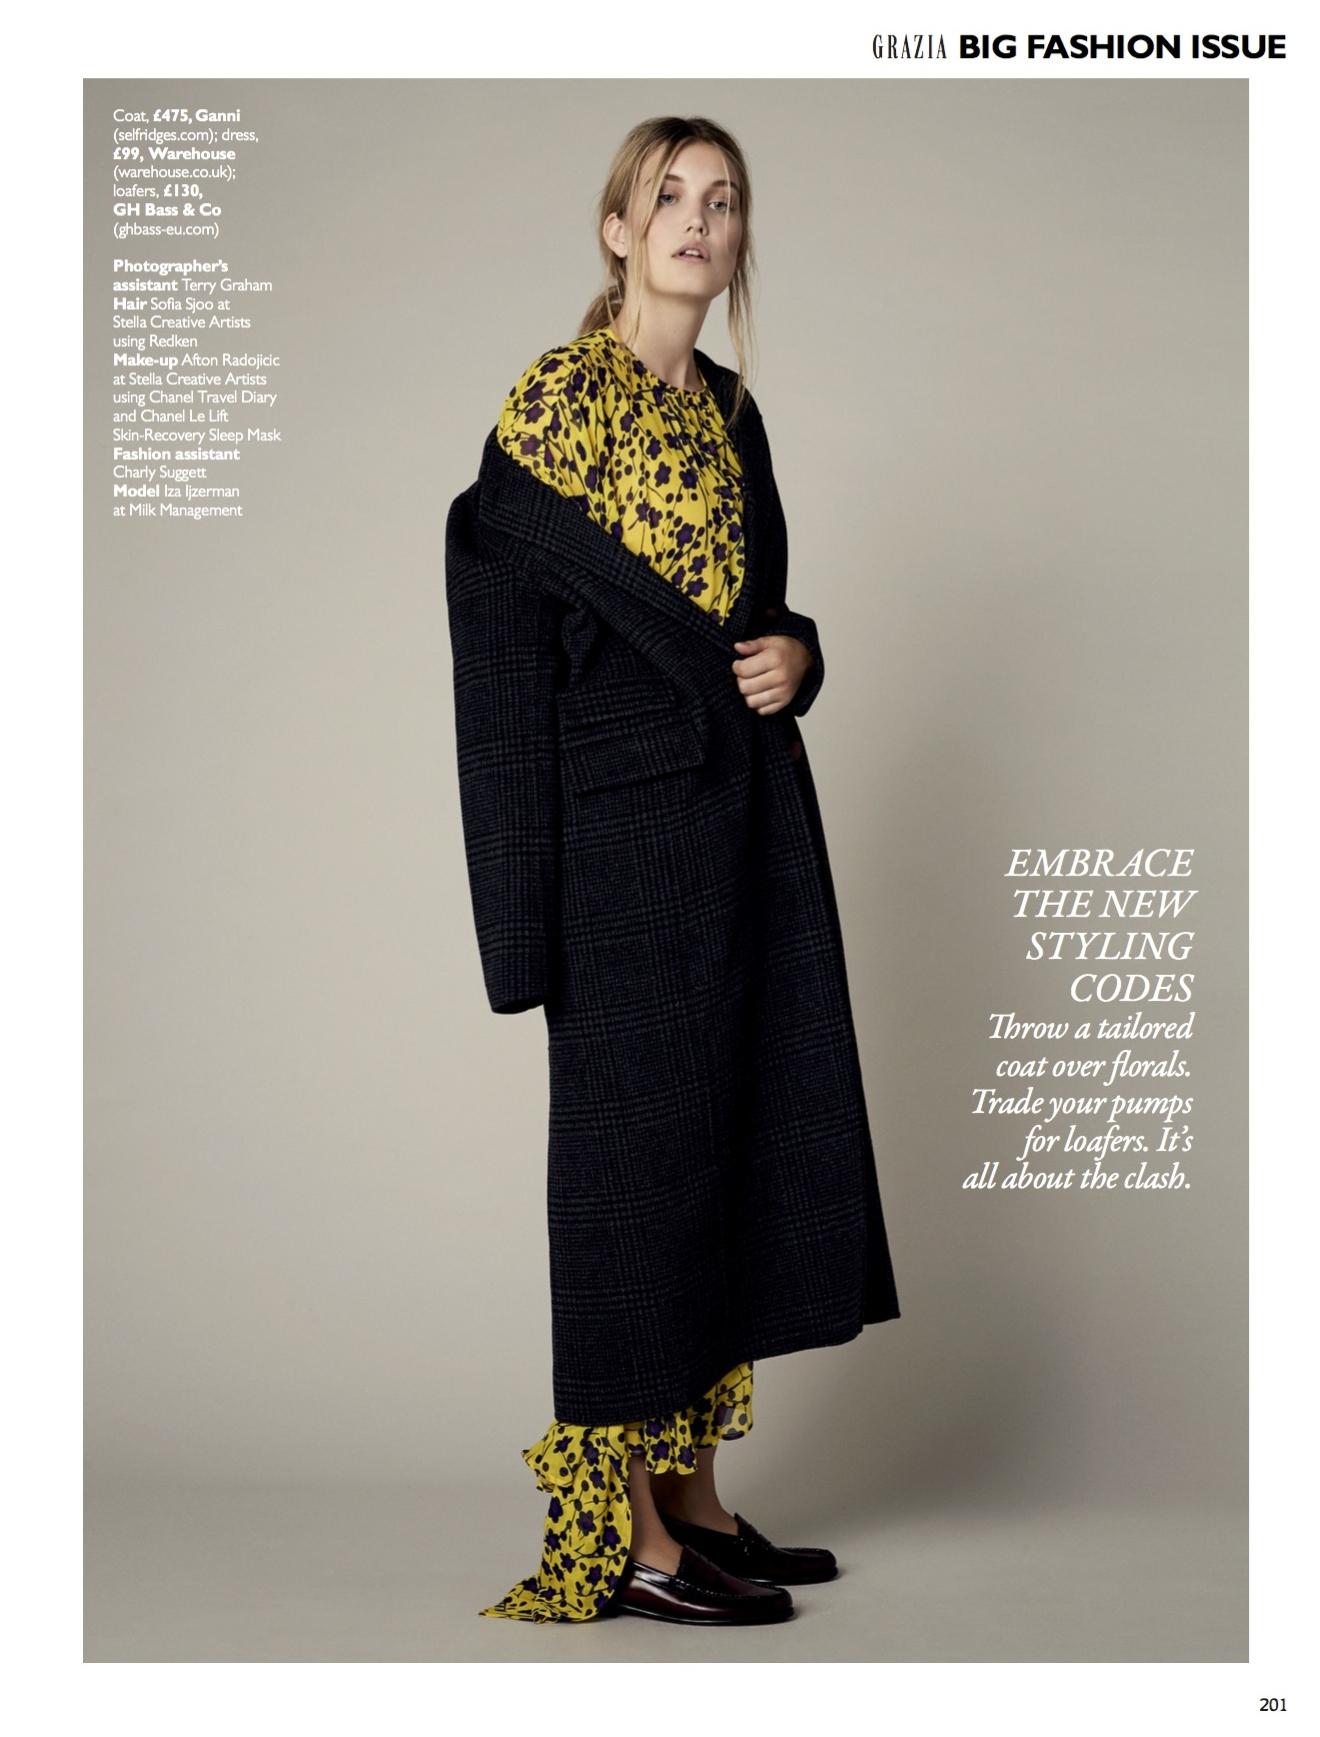 Fashion_Wardrobe Workshop Plus Size due 1_9_pdf_8 copy.jpg